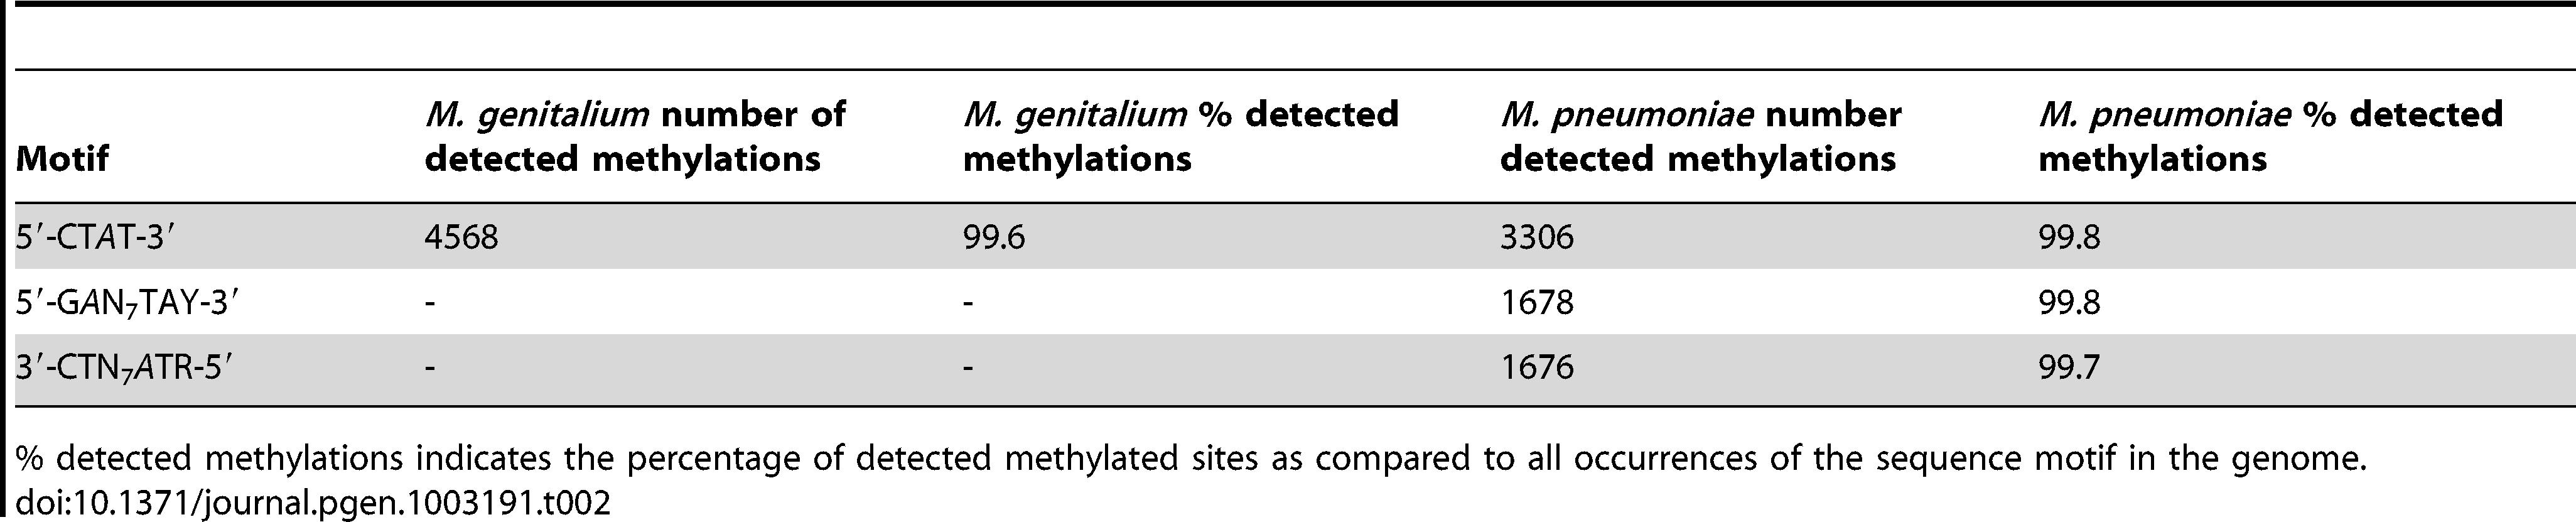 Summary of discovered methylation motifs in <i>M. genitalium</i> and <i>M.pneumoniae</i>.